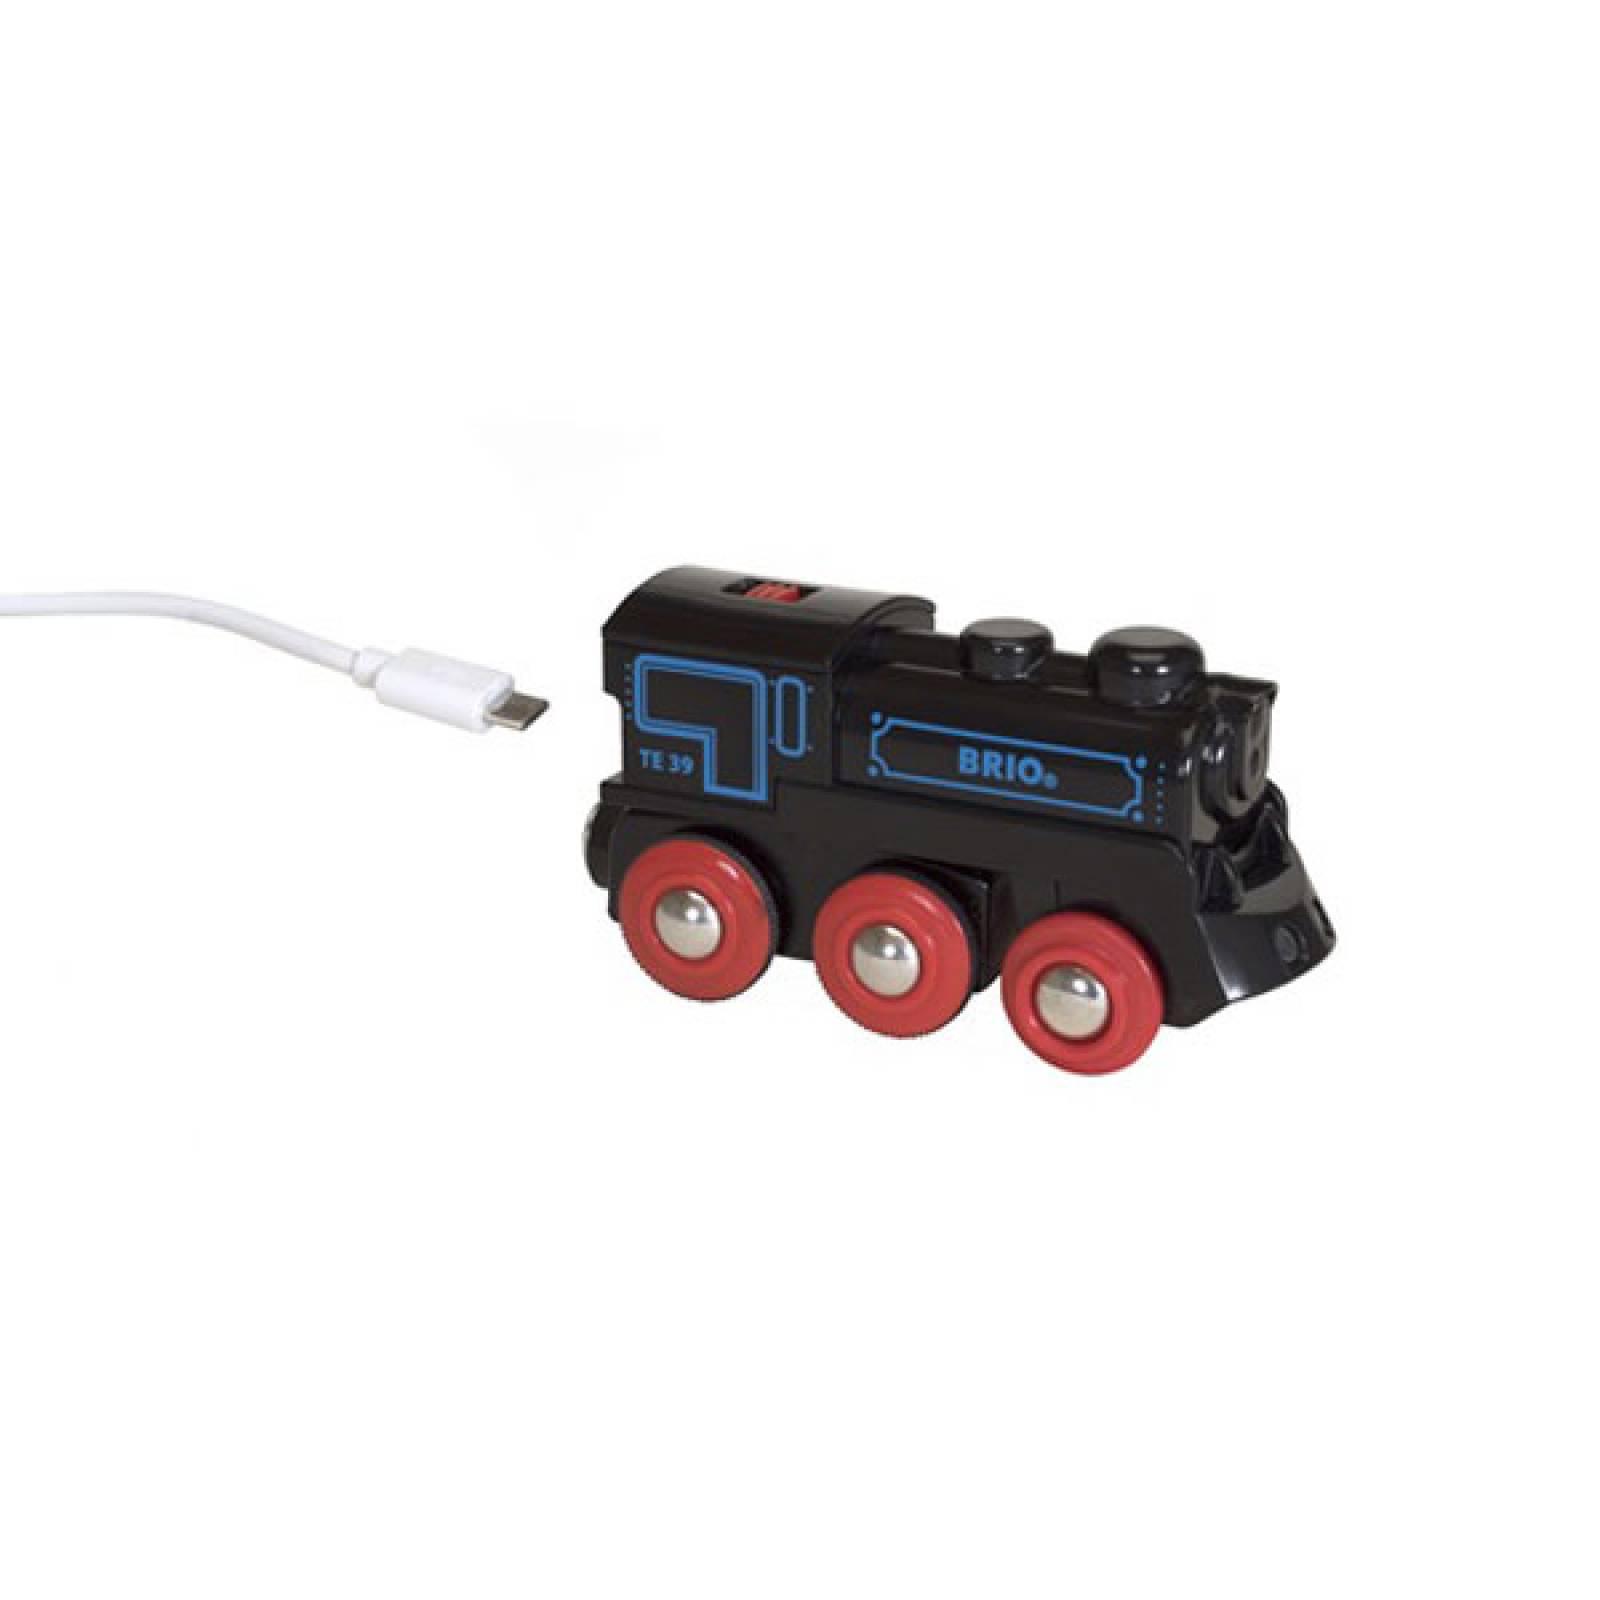 Rechargeable Engine Mini USB BRIO Wooden Railway Age 3+